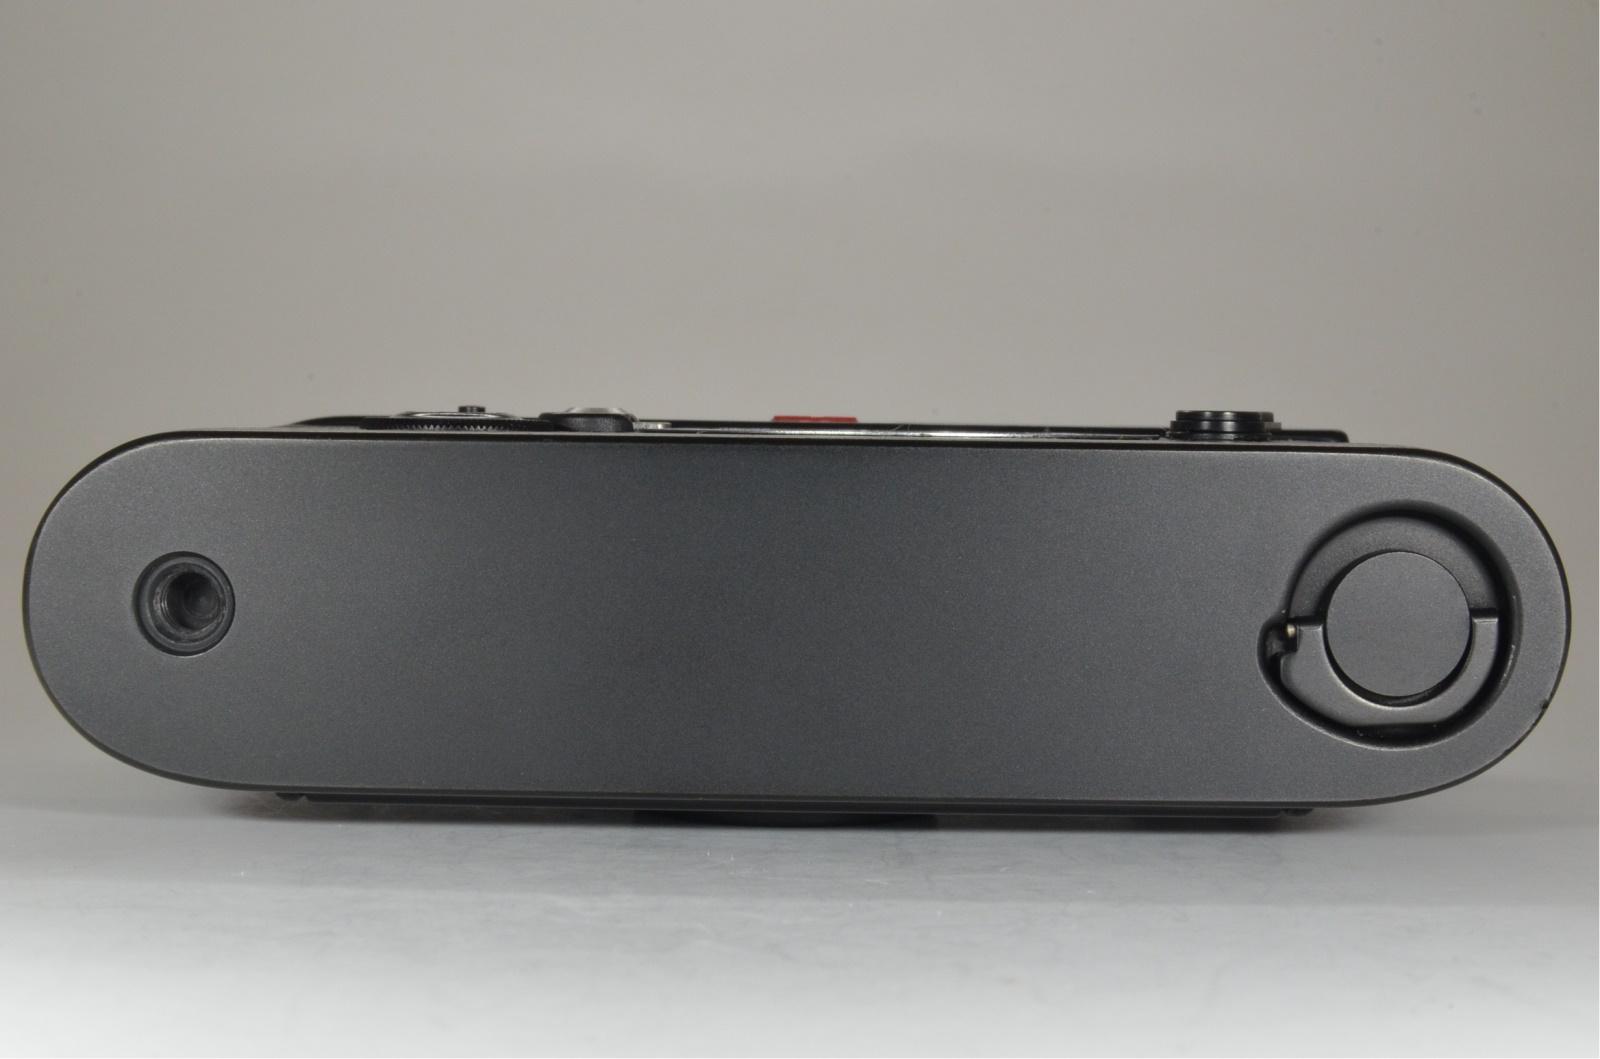 leica m6 0.72 black rangefinder serial no.1703863 year 1986 from japan